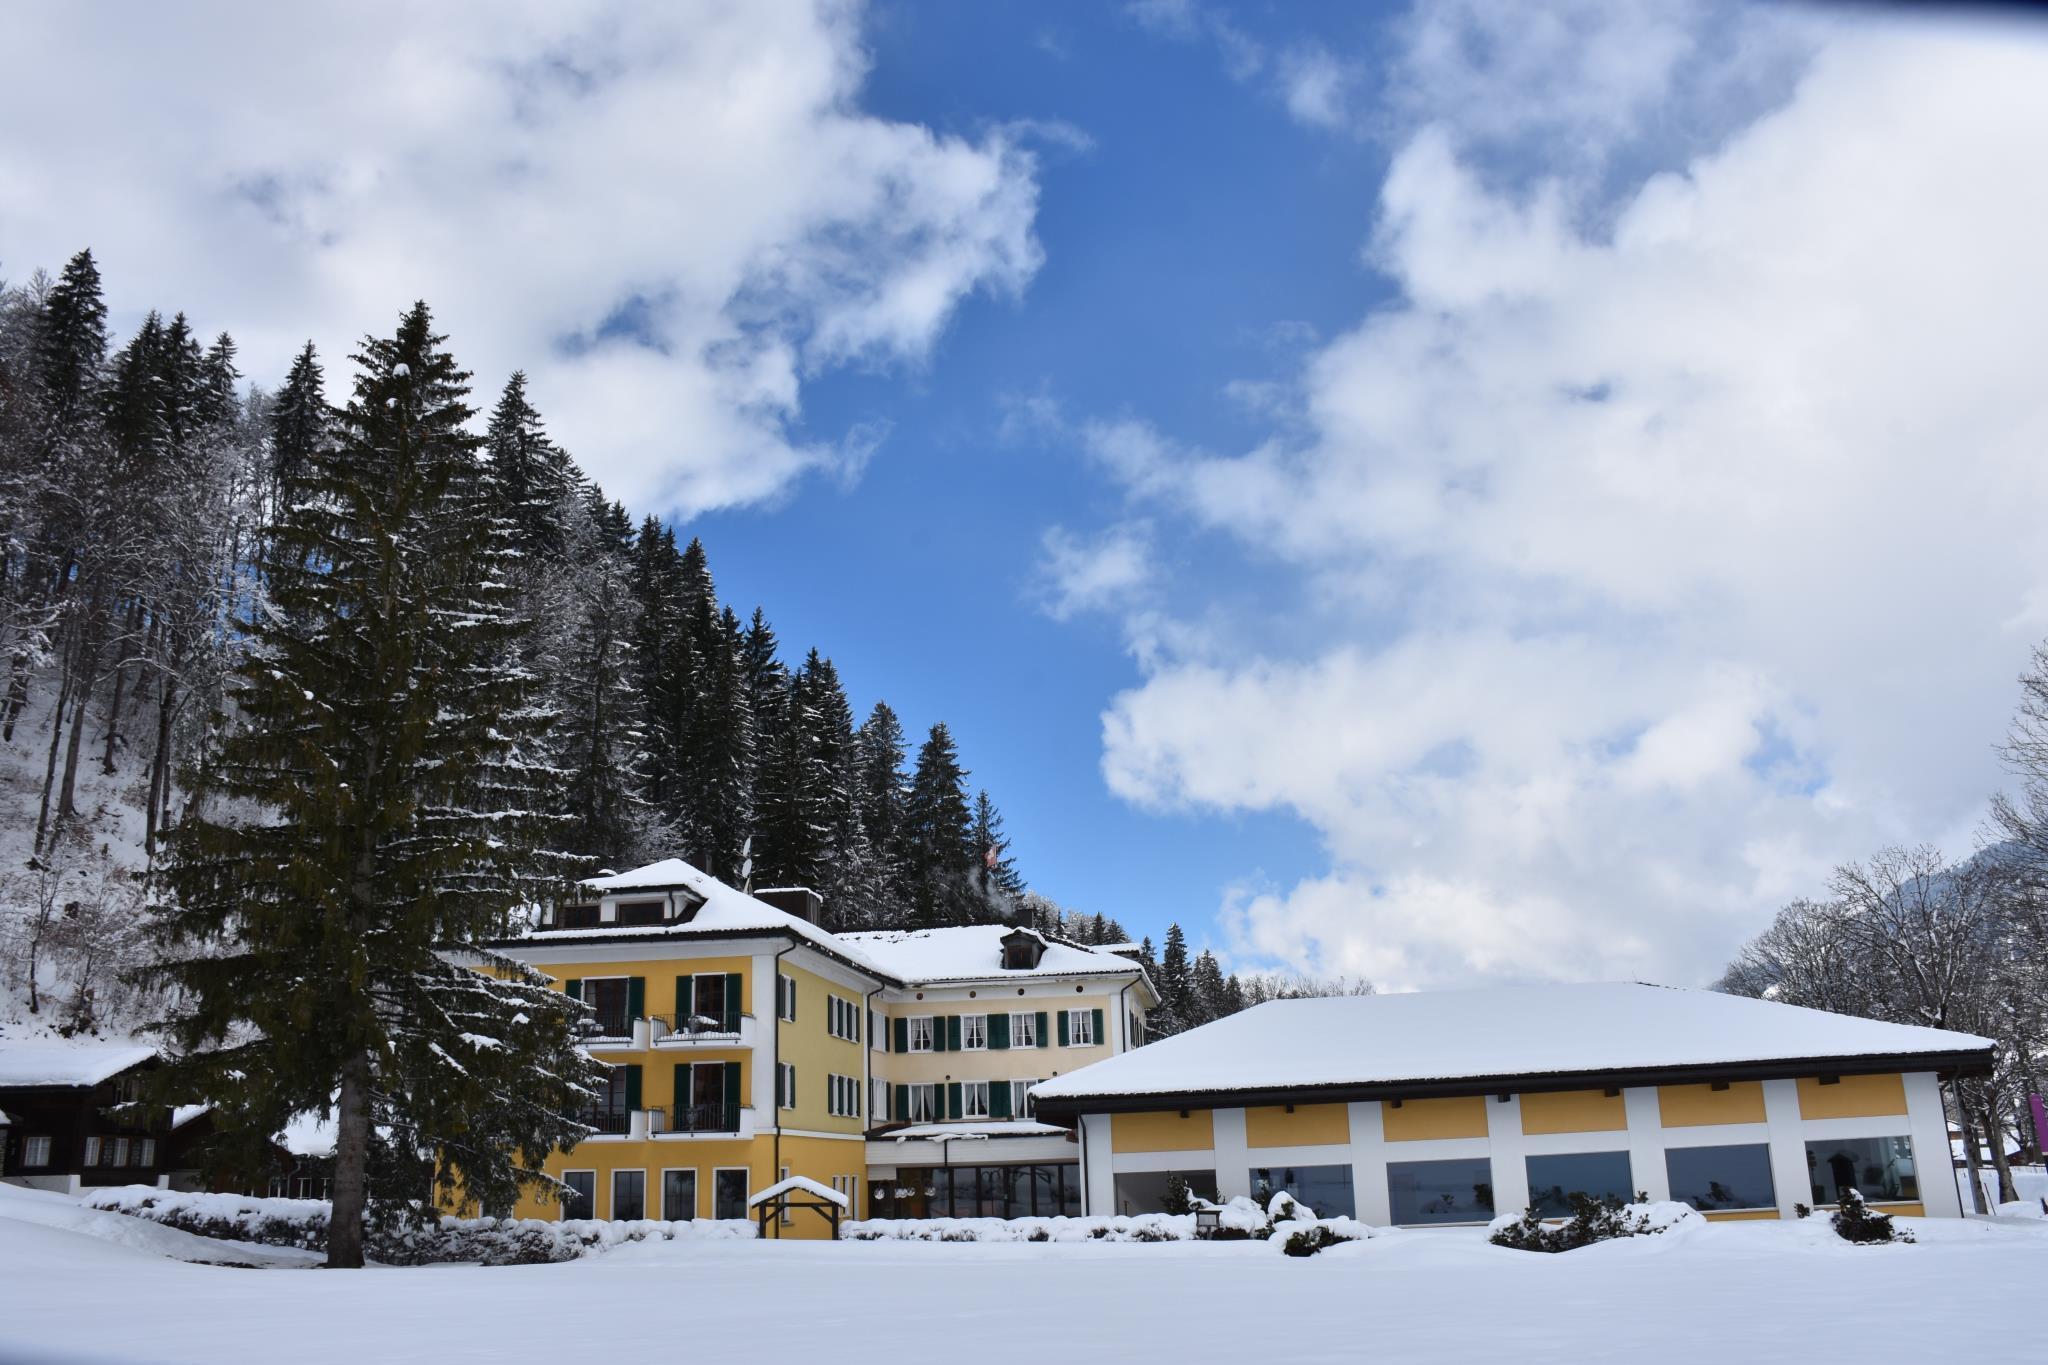 Thermal Hotel Bad Serneus